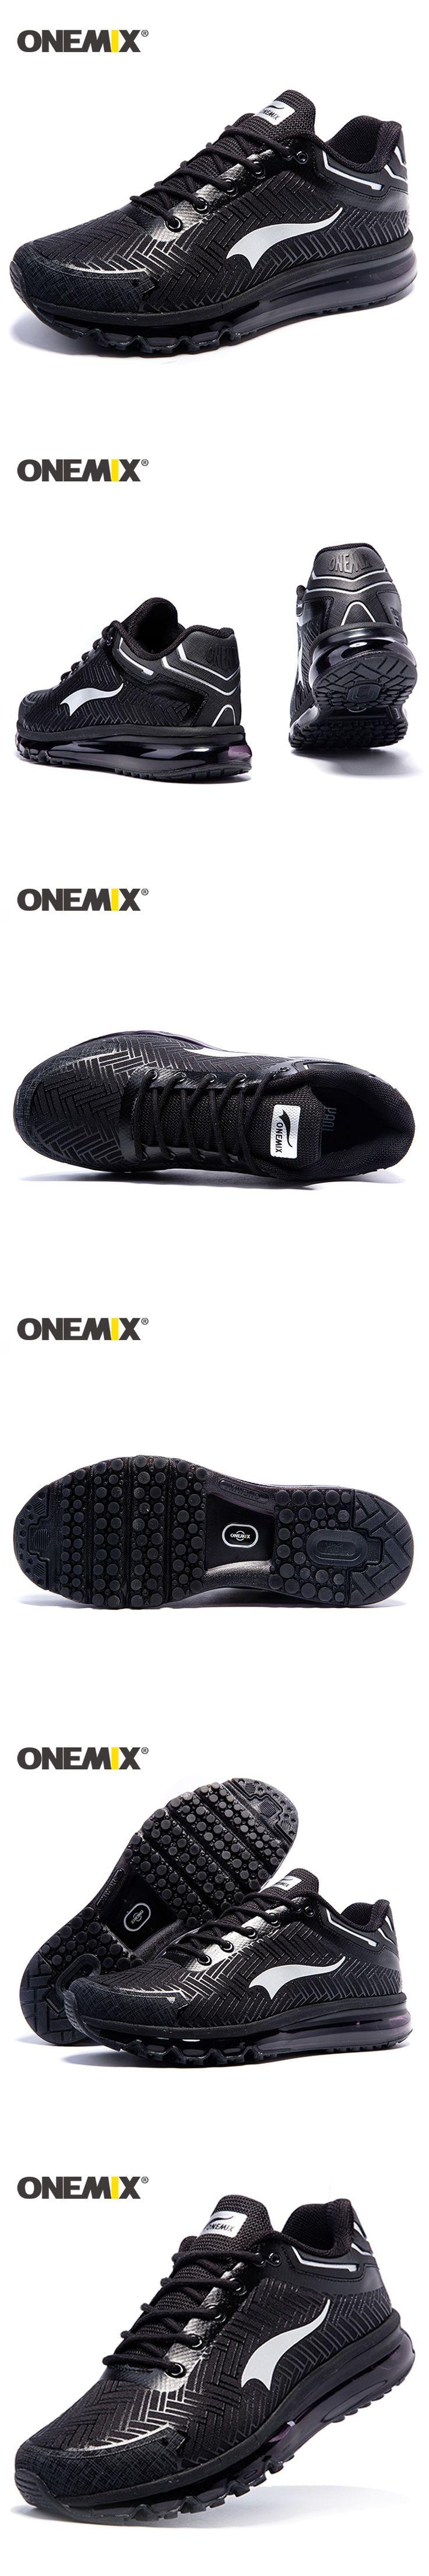 Onemix 2017 Brand men running shoes sports sneakers outdoor walking shoes for men light jogging shoes trekking sneakers man